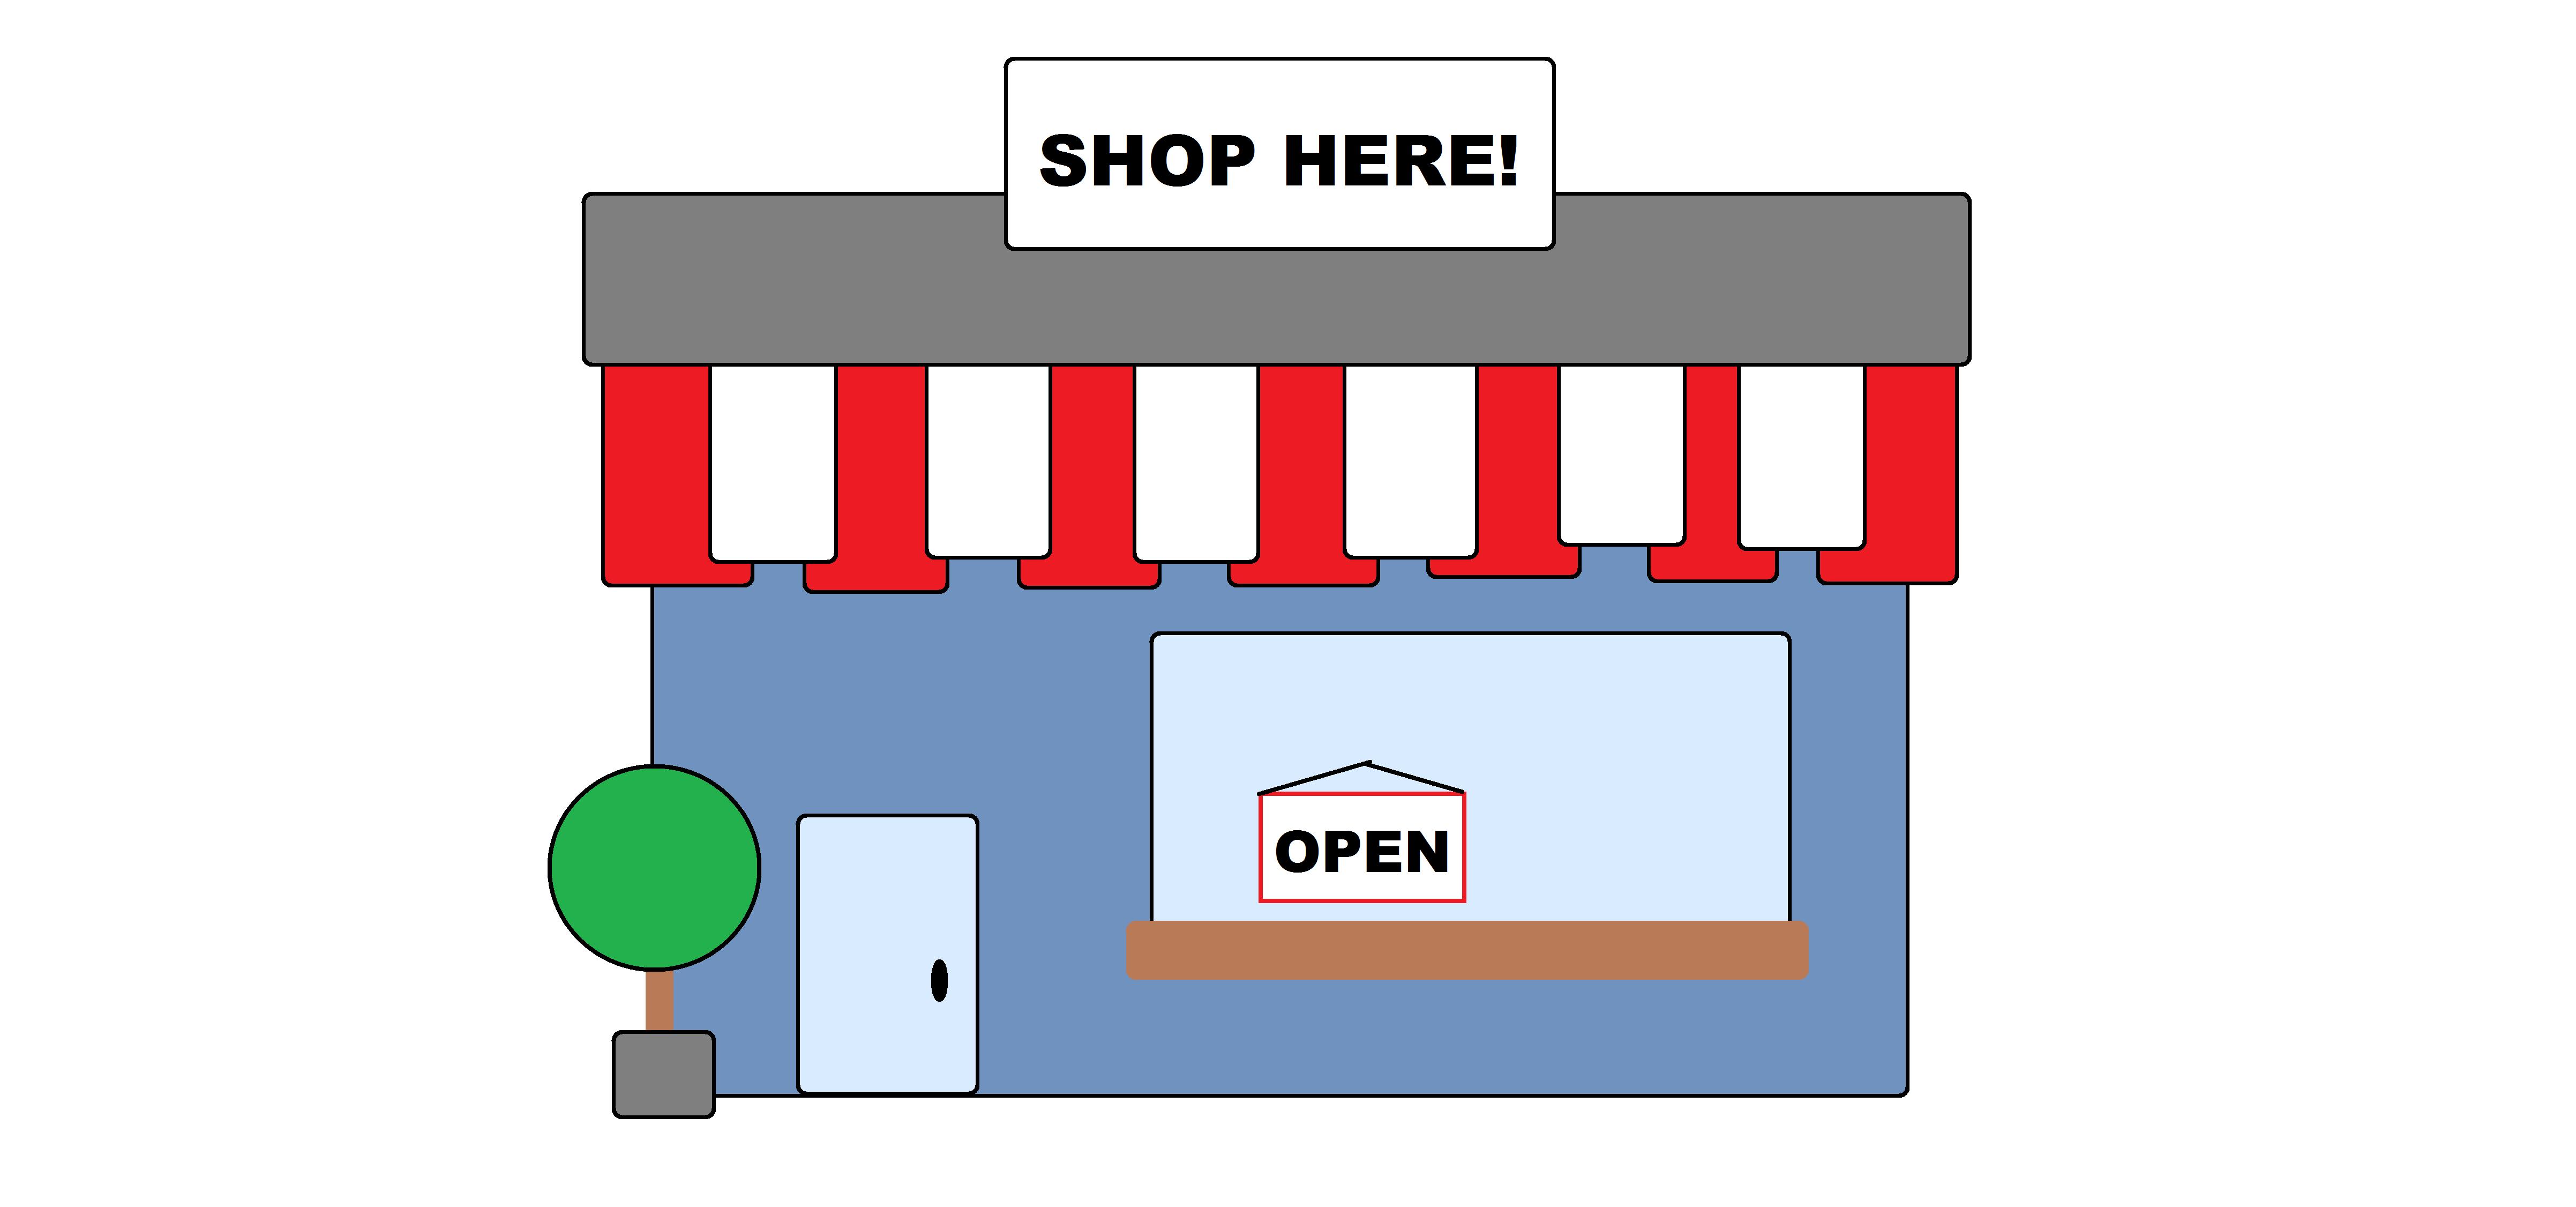 shop sign 2